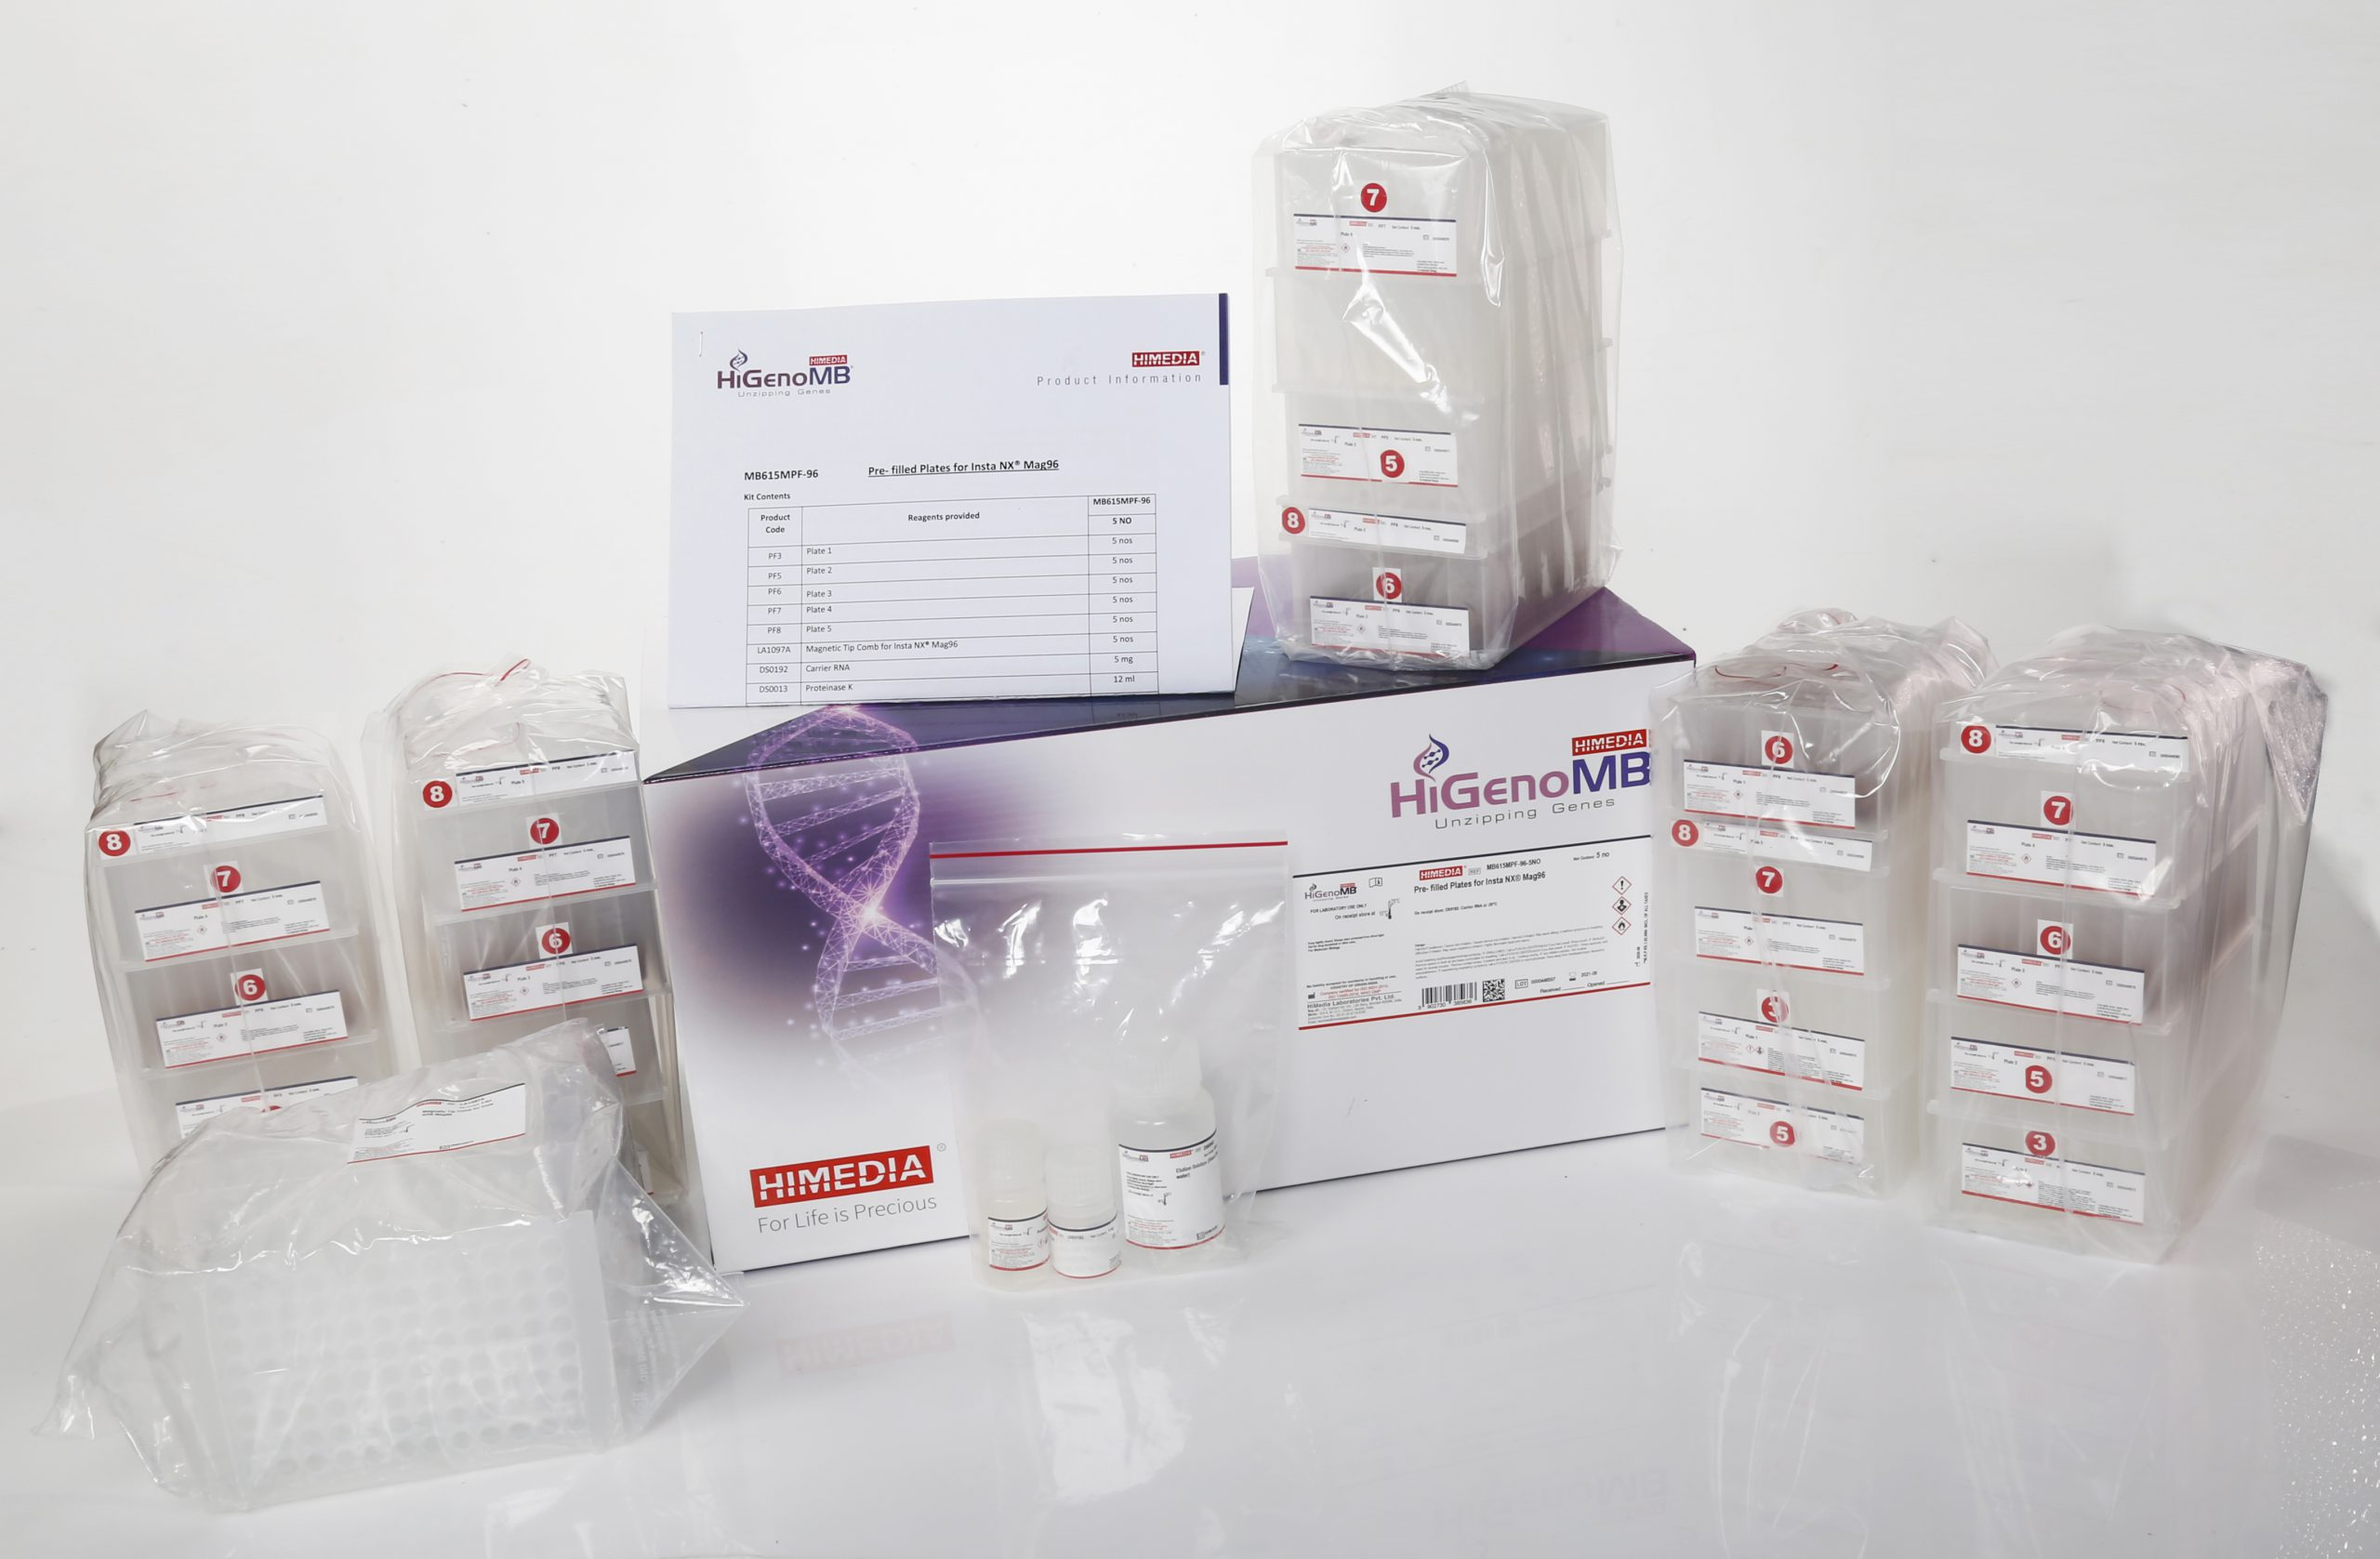 Gebrauchsfertige RNA-Extraktionsplatten für Insta NX Mag96